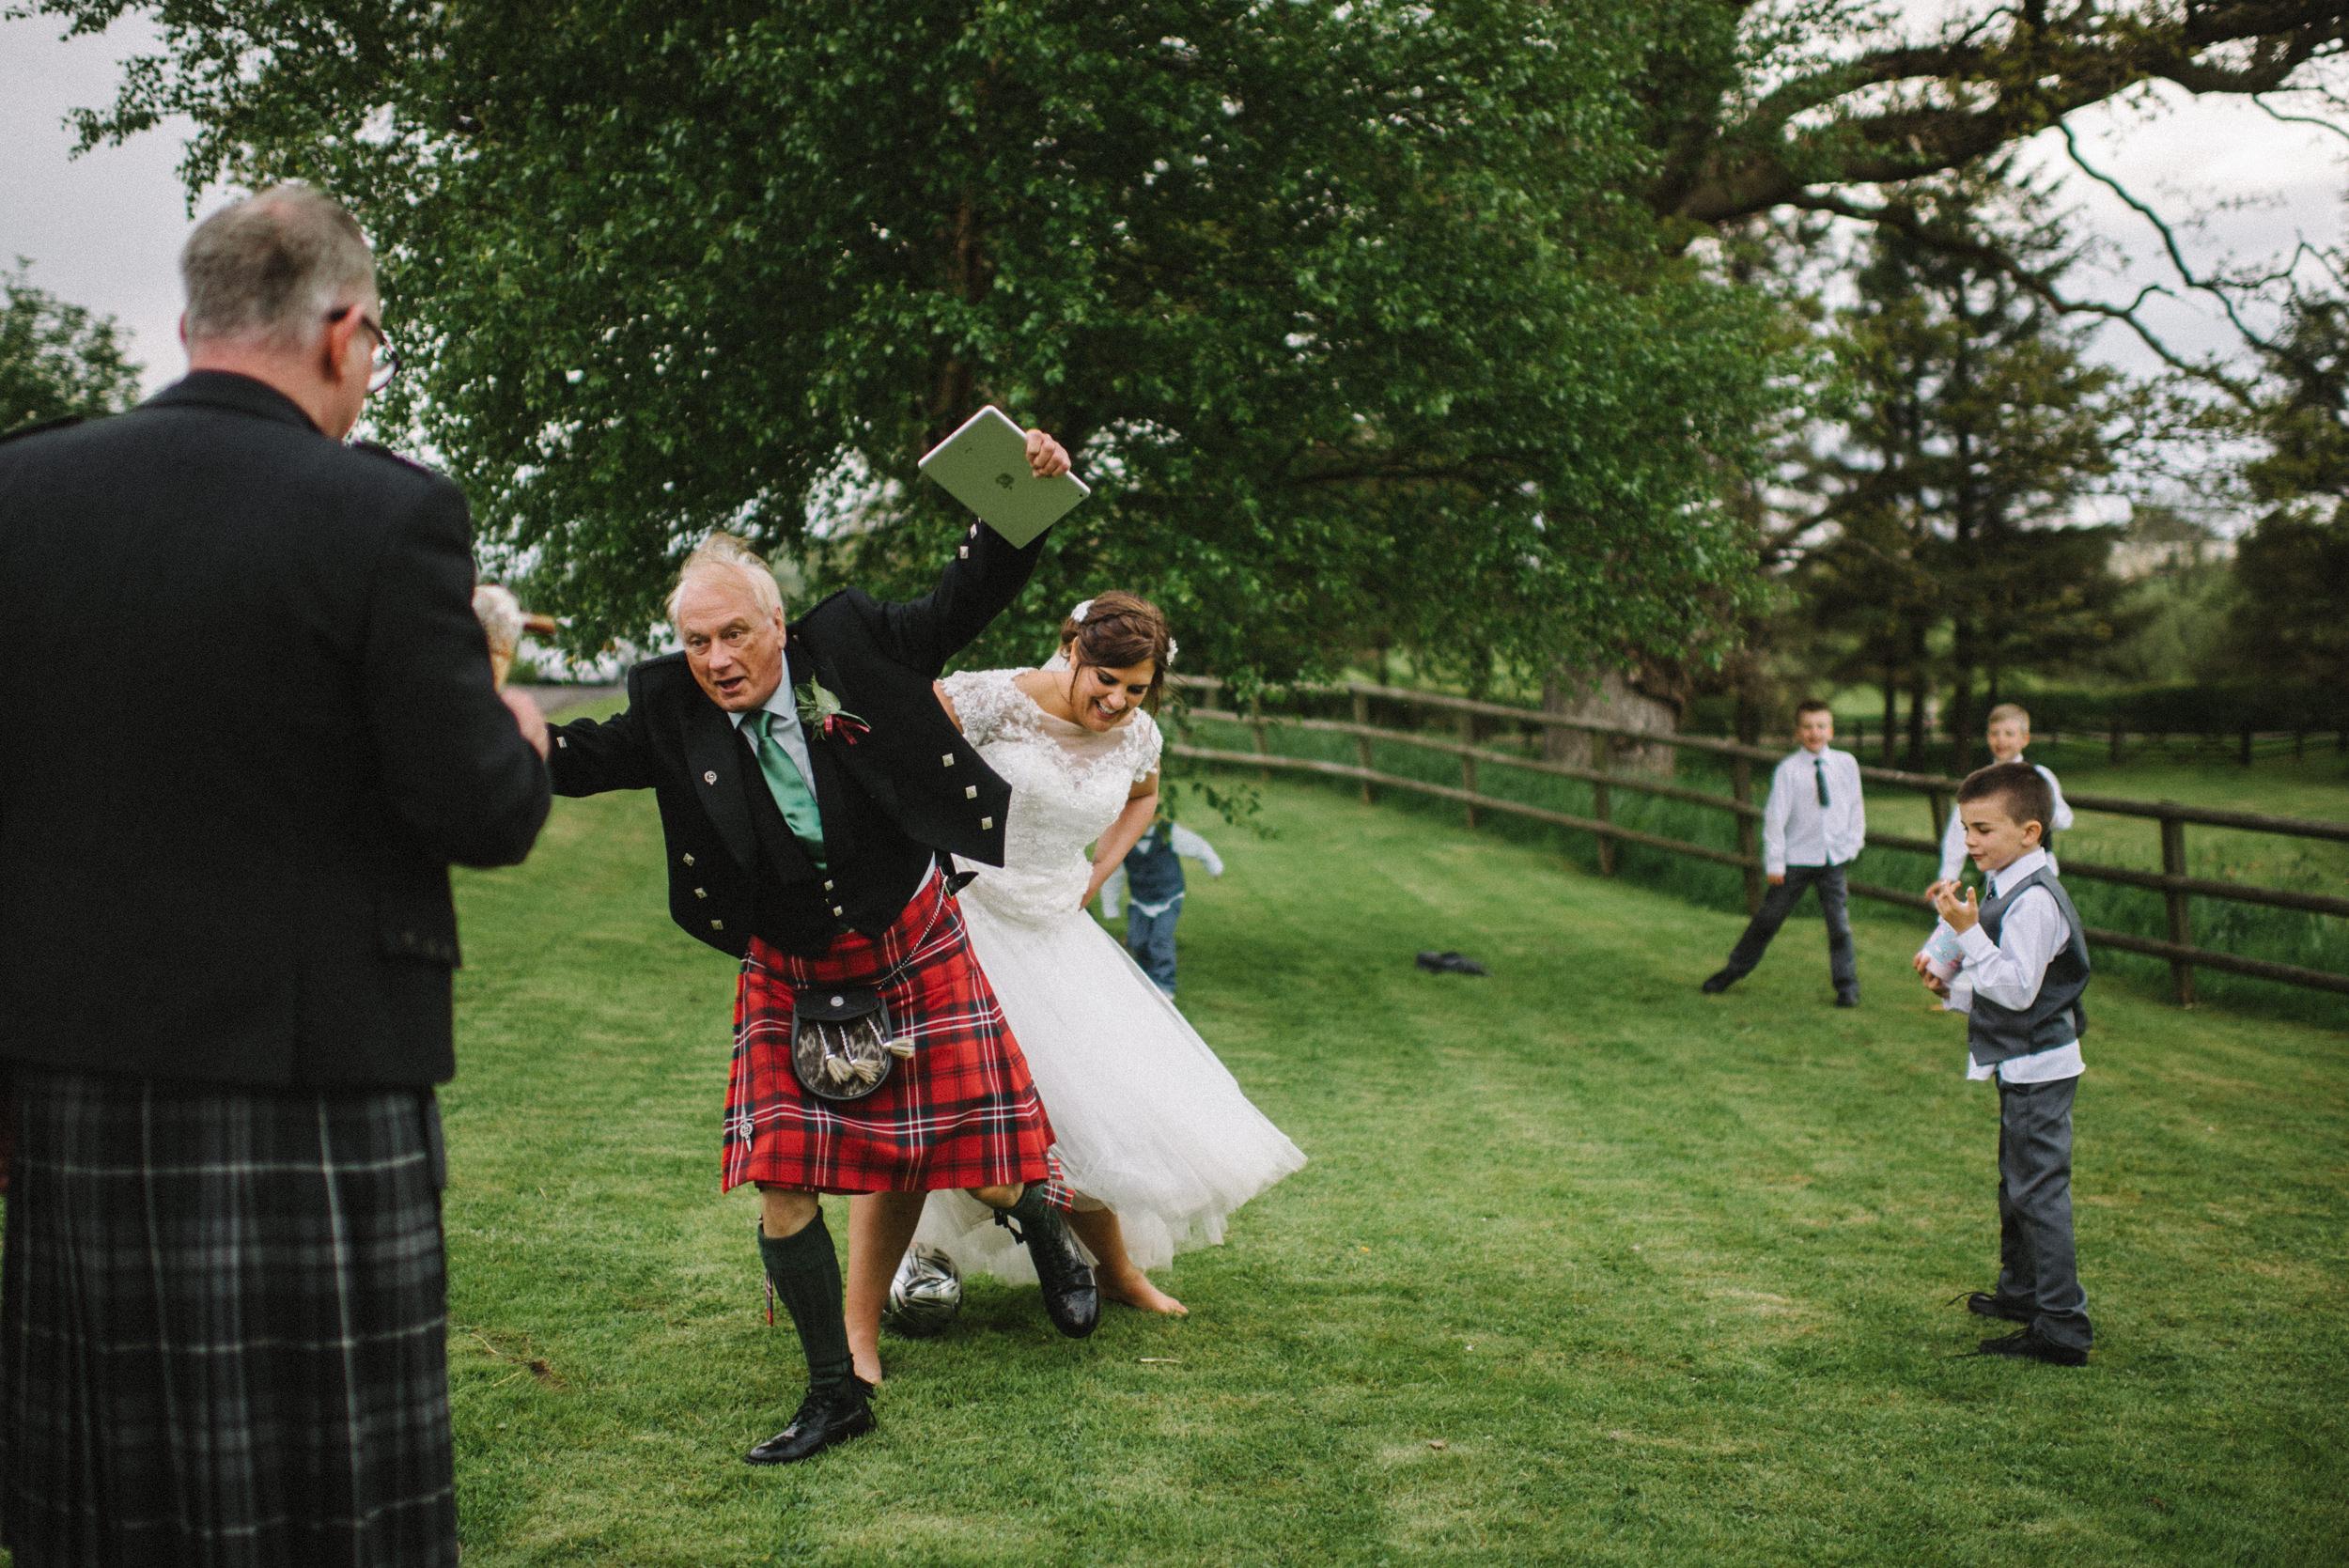 0035-alternative-wedding-portrait-family-kids-photographer-glasgow-scotland.JPG